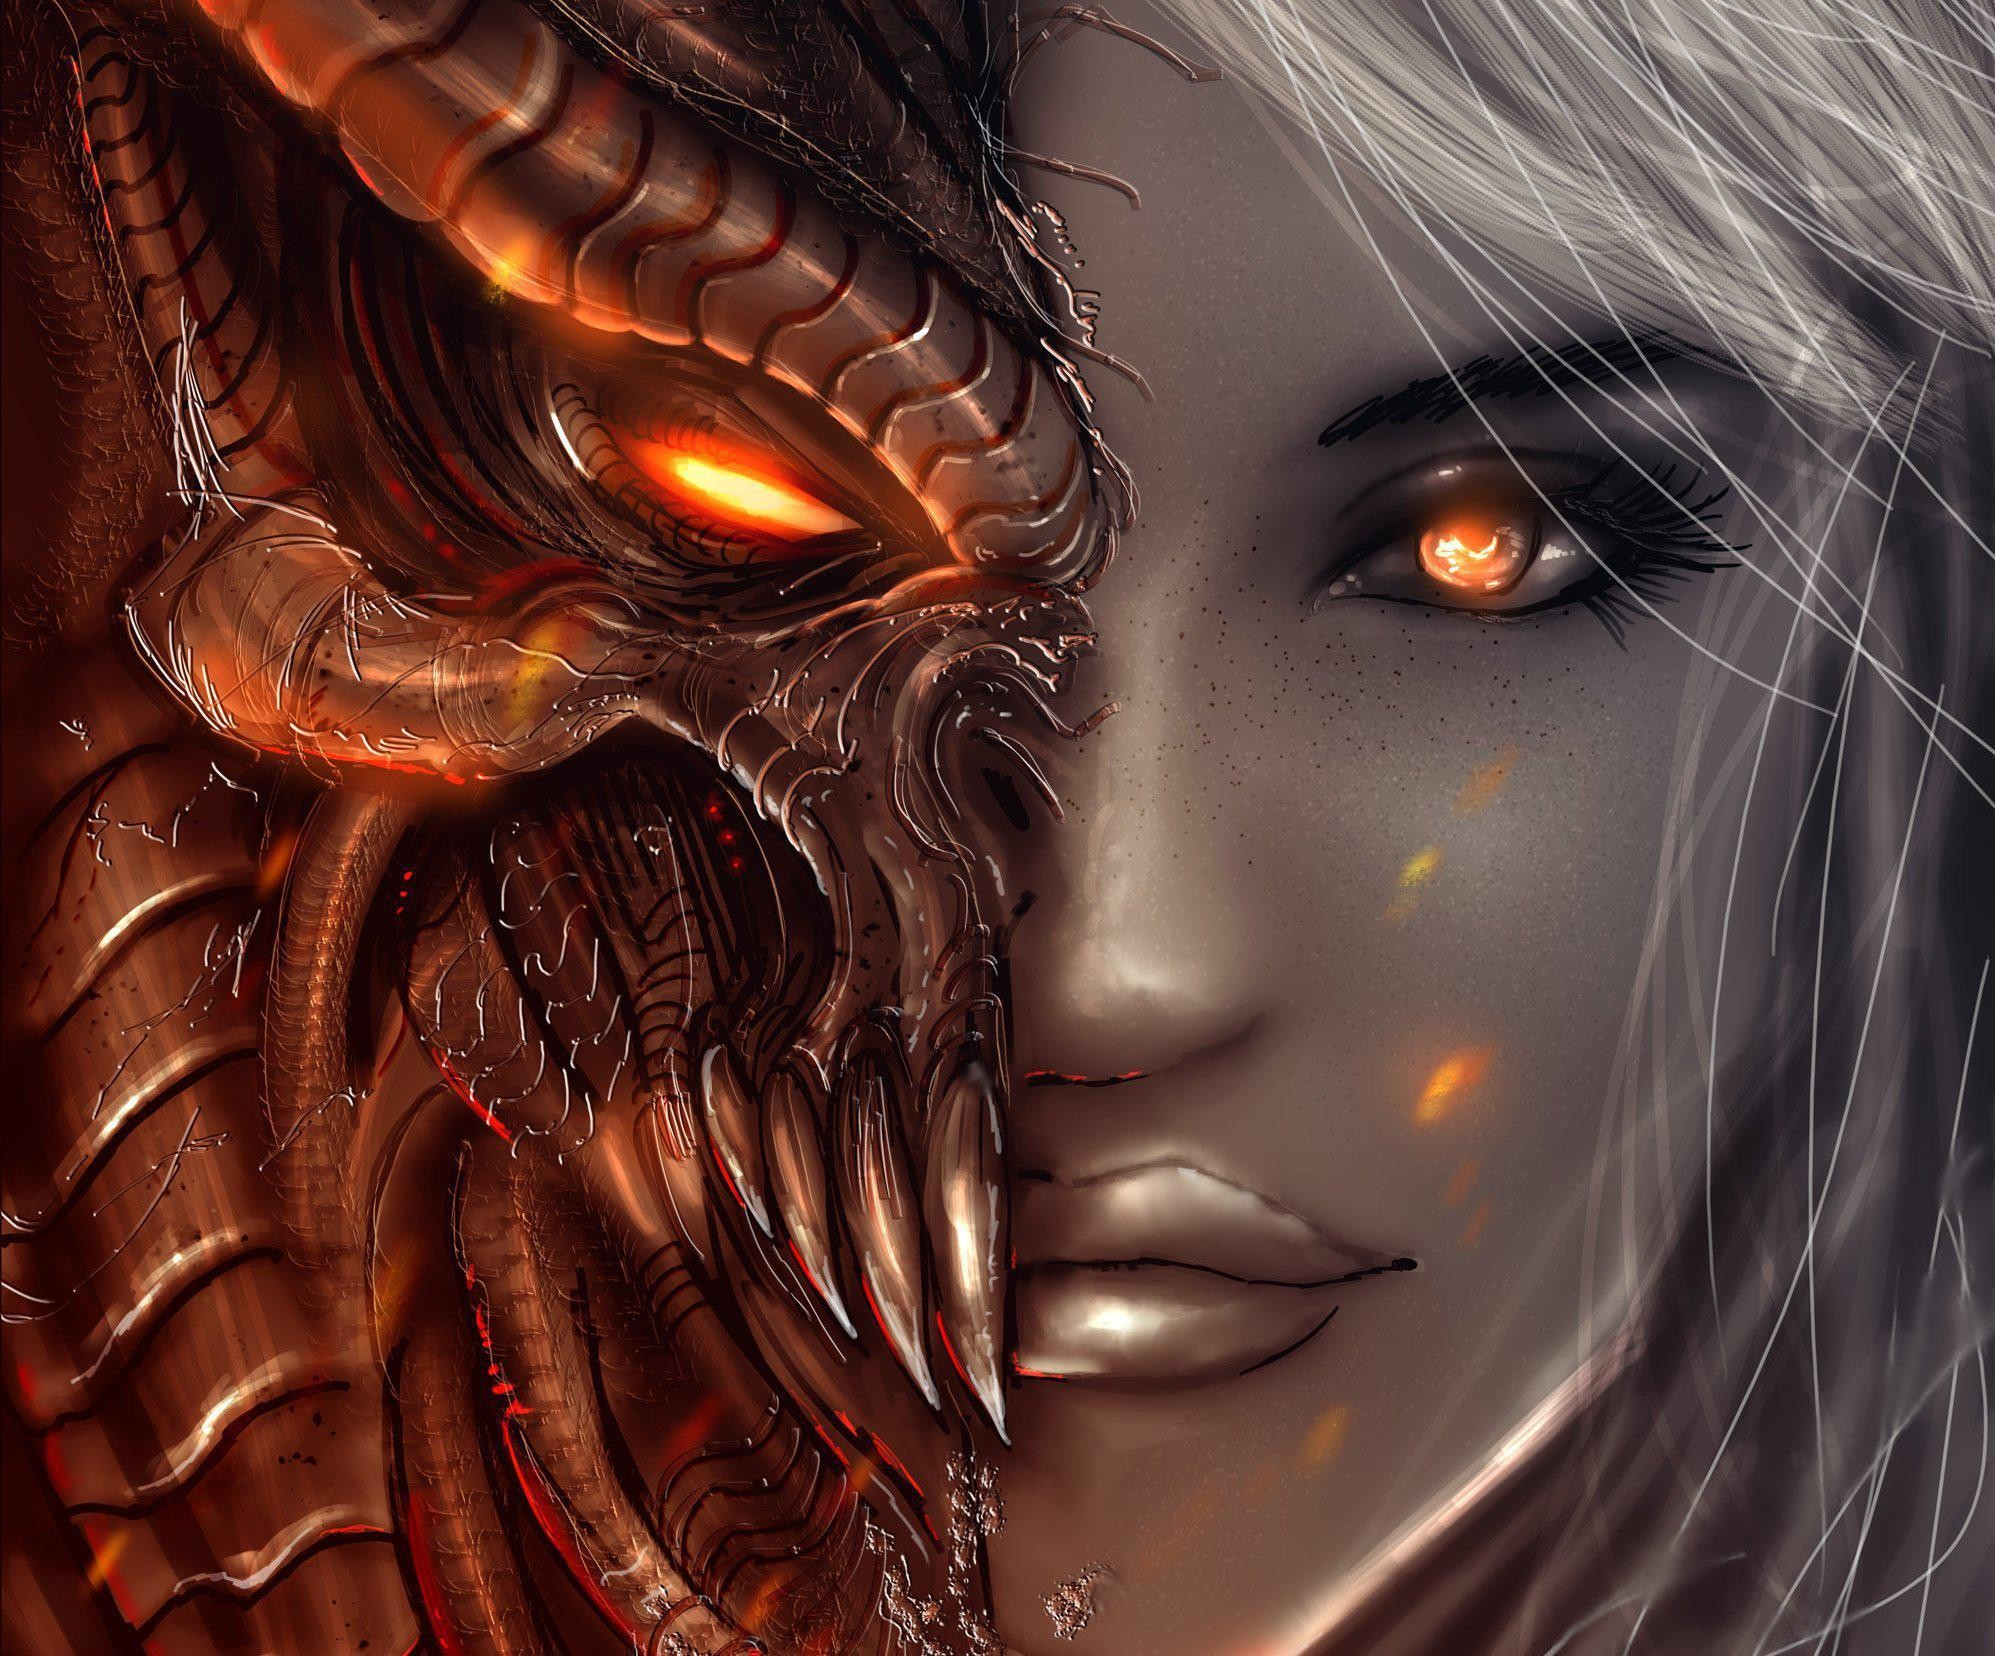 Res: 1995x1656, diablo 3, girl, art, angels, demons